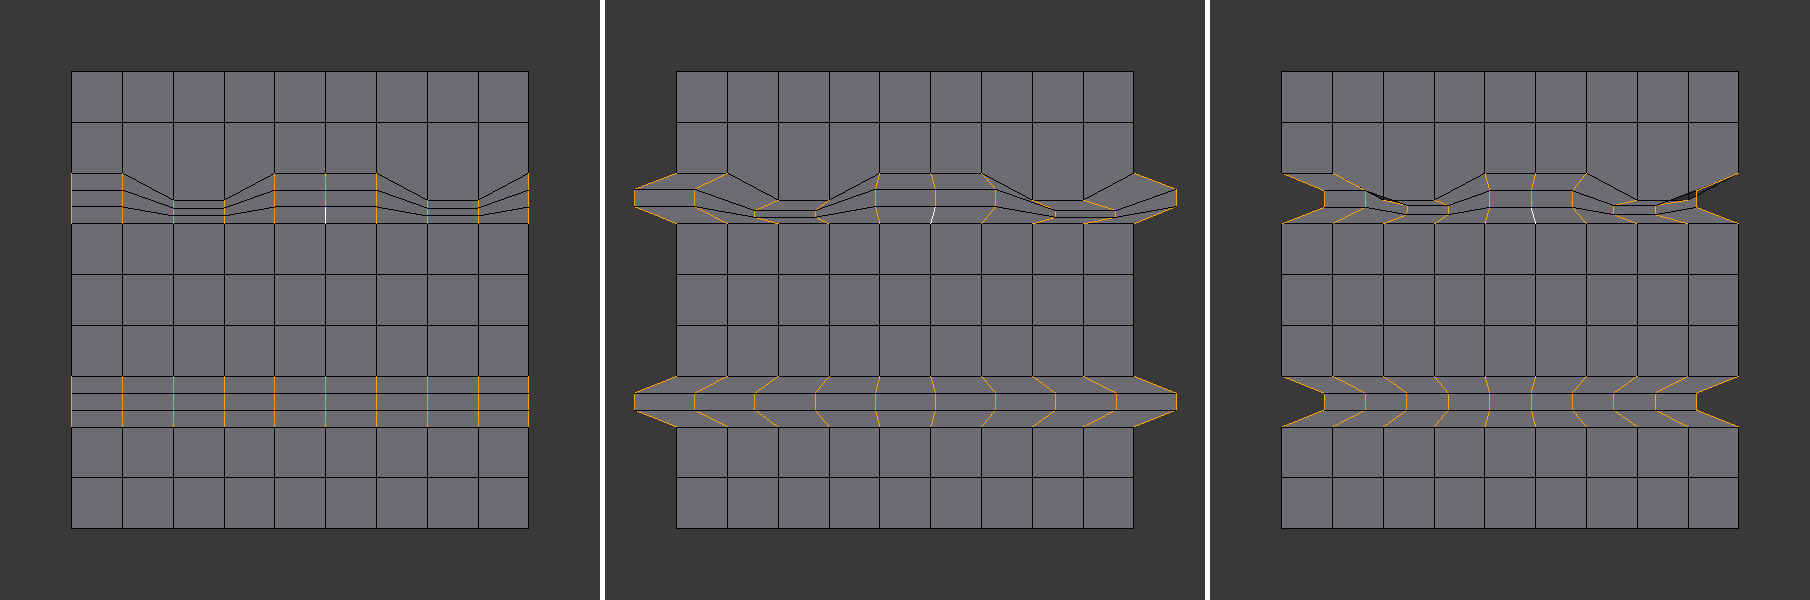 subdivide-edge-ring-factor